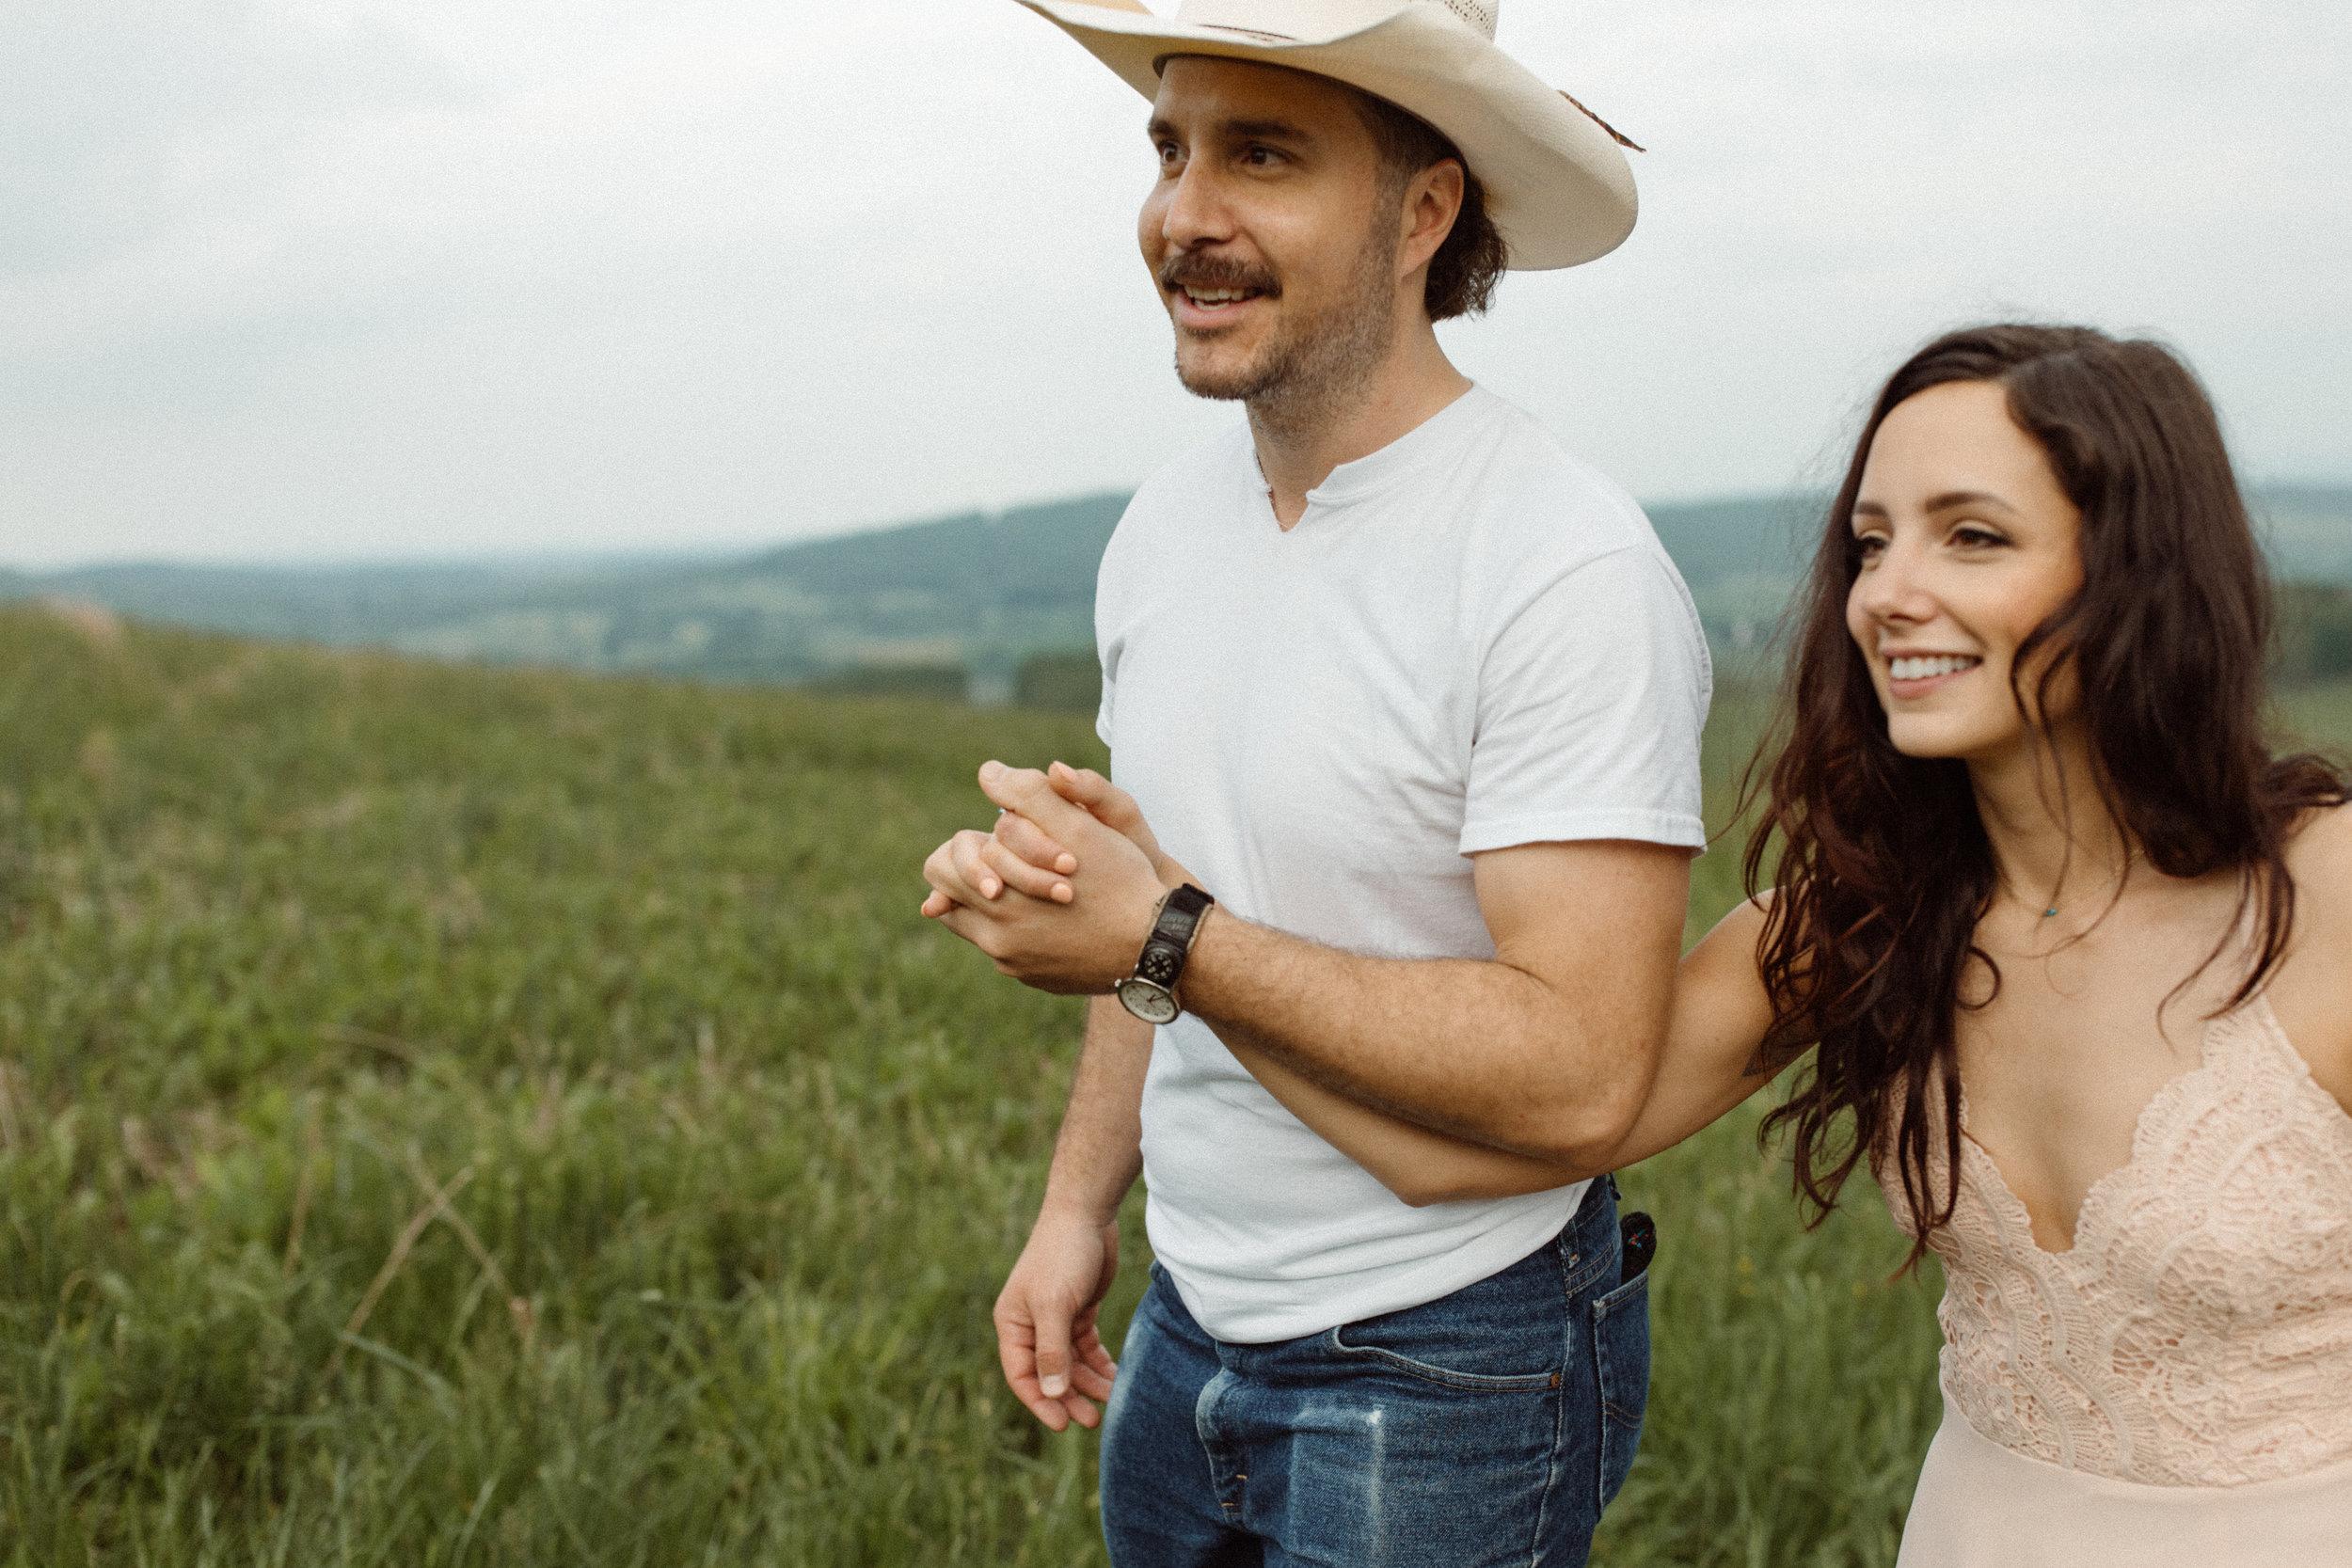 kelsey&mark-engagement-skymeadows-2019-peytoncurry-9416.jpg